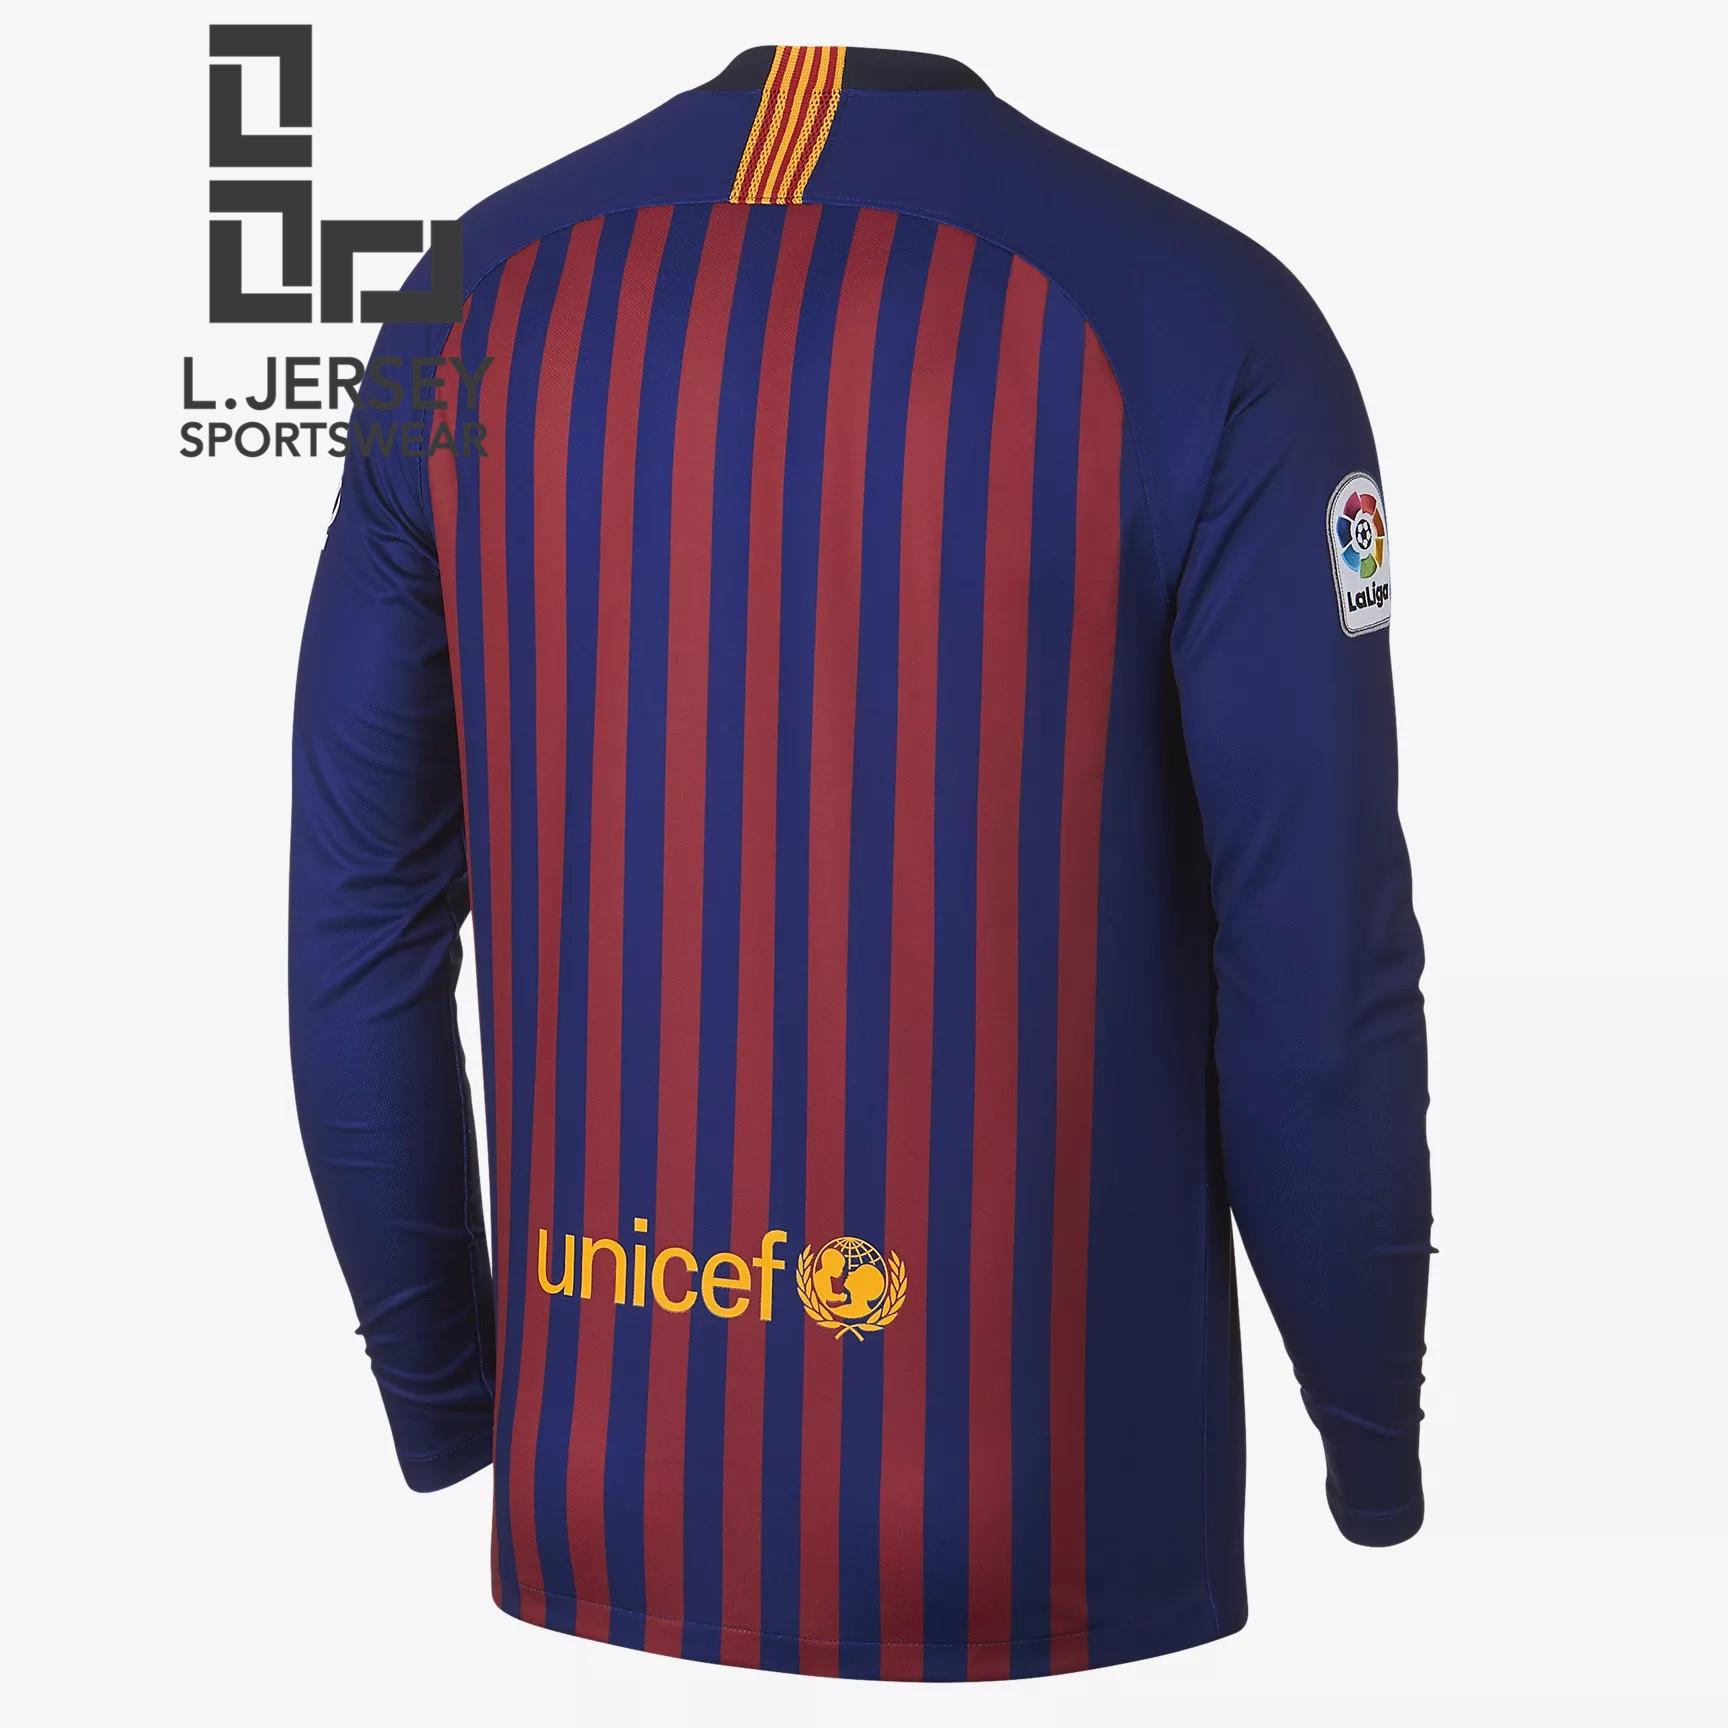 new style 83d52 51e0f Barcelona Men Home Long Sleeve 2018/19 Fans Jersey